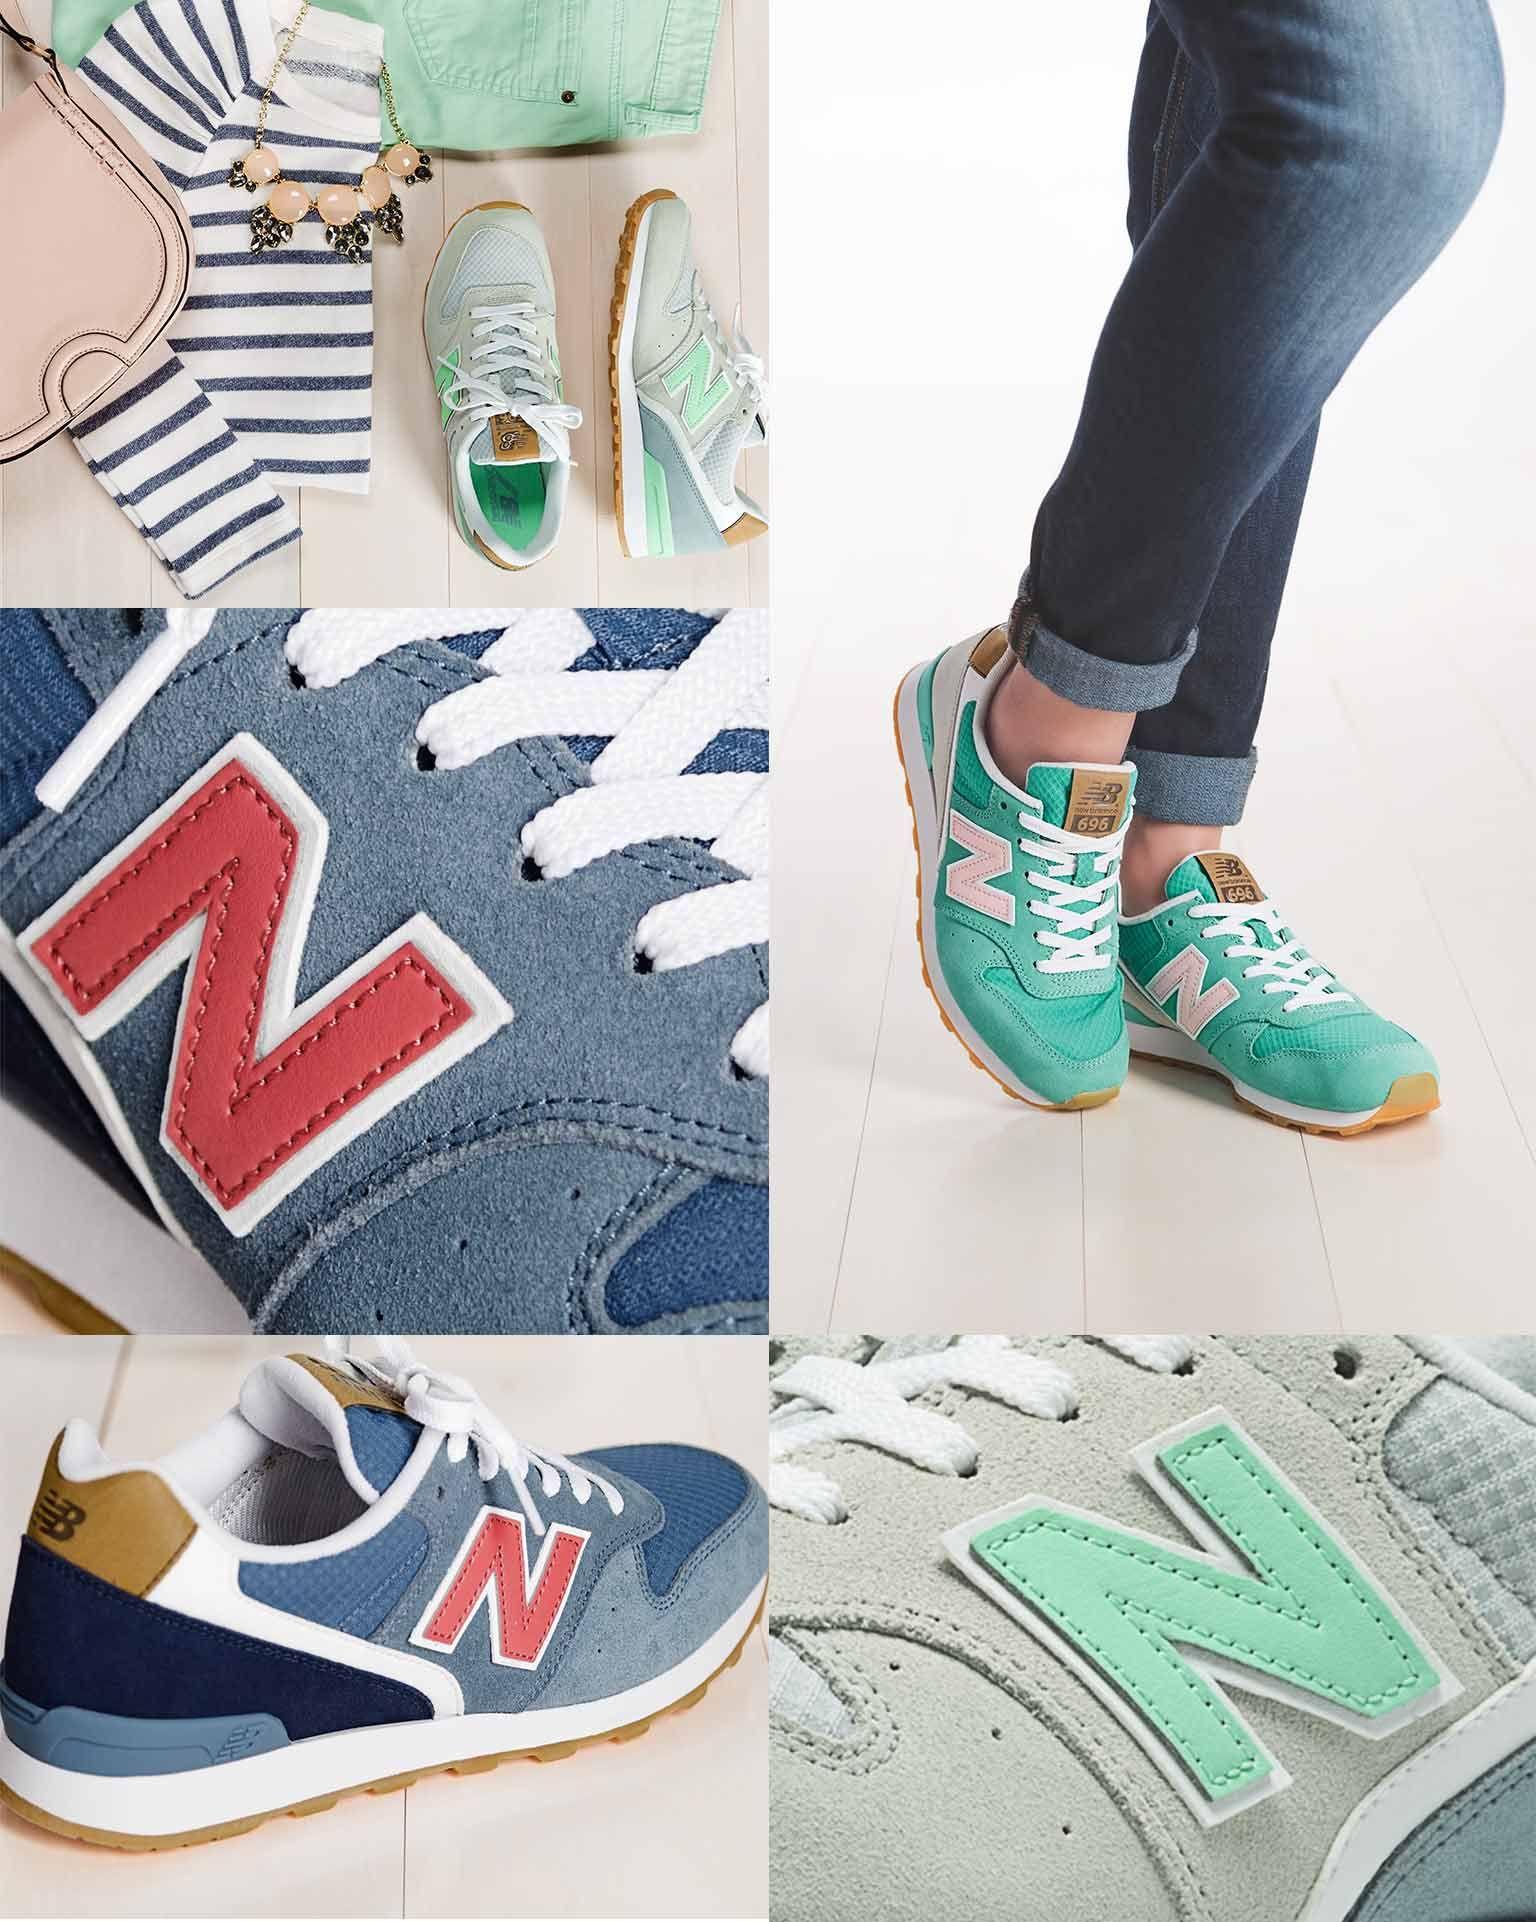 best sneakers 3bca4 17452 New Balance 696 - Women's 696 - Classic, - New Balance - US ...